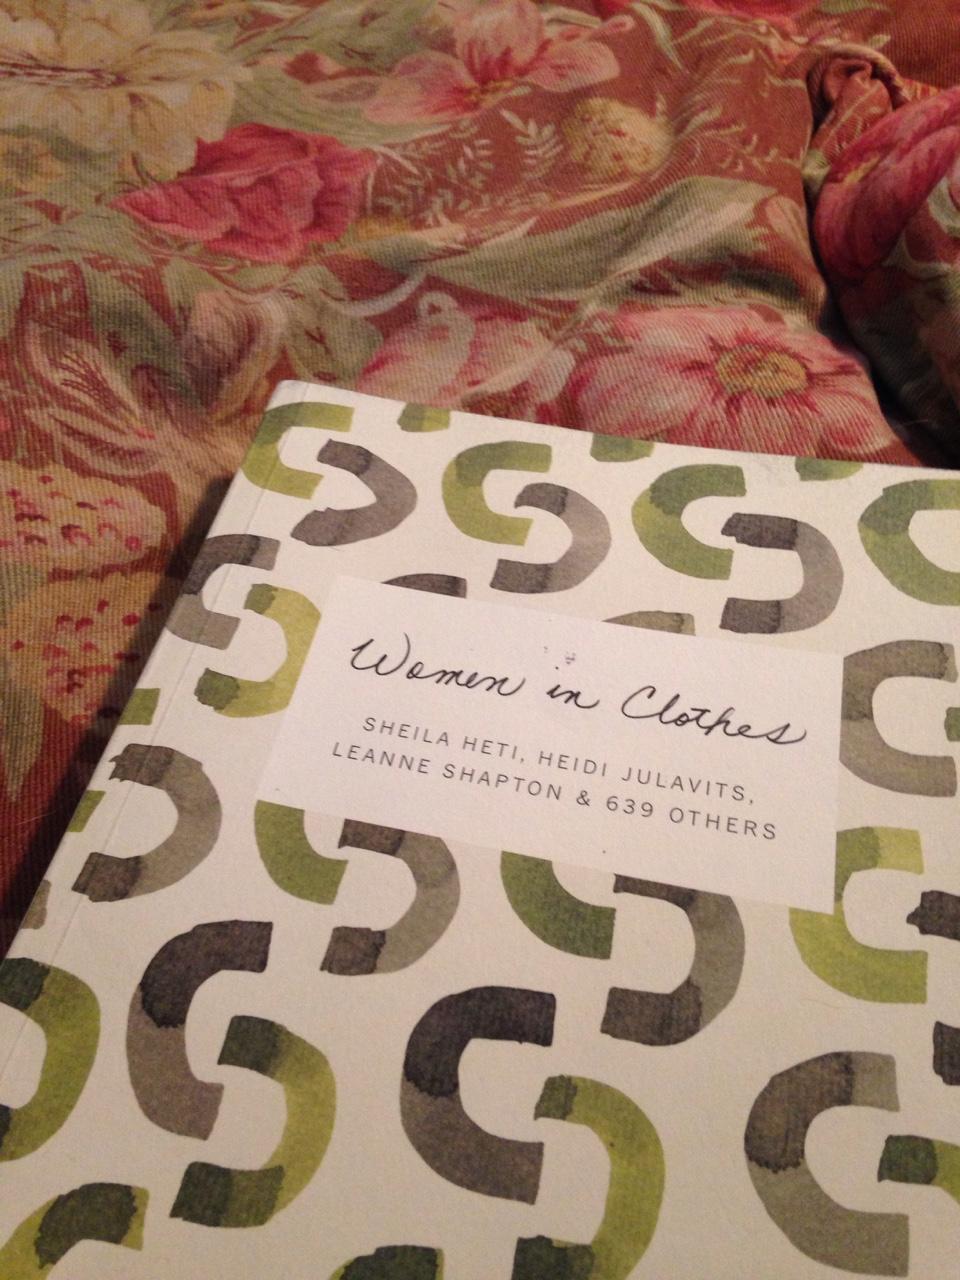 Sunday morning reads